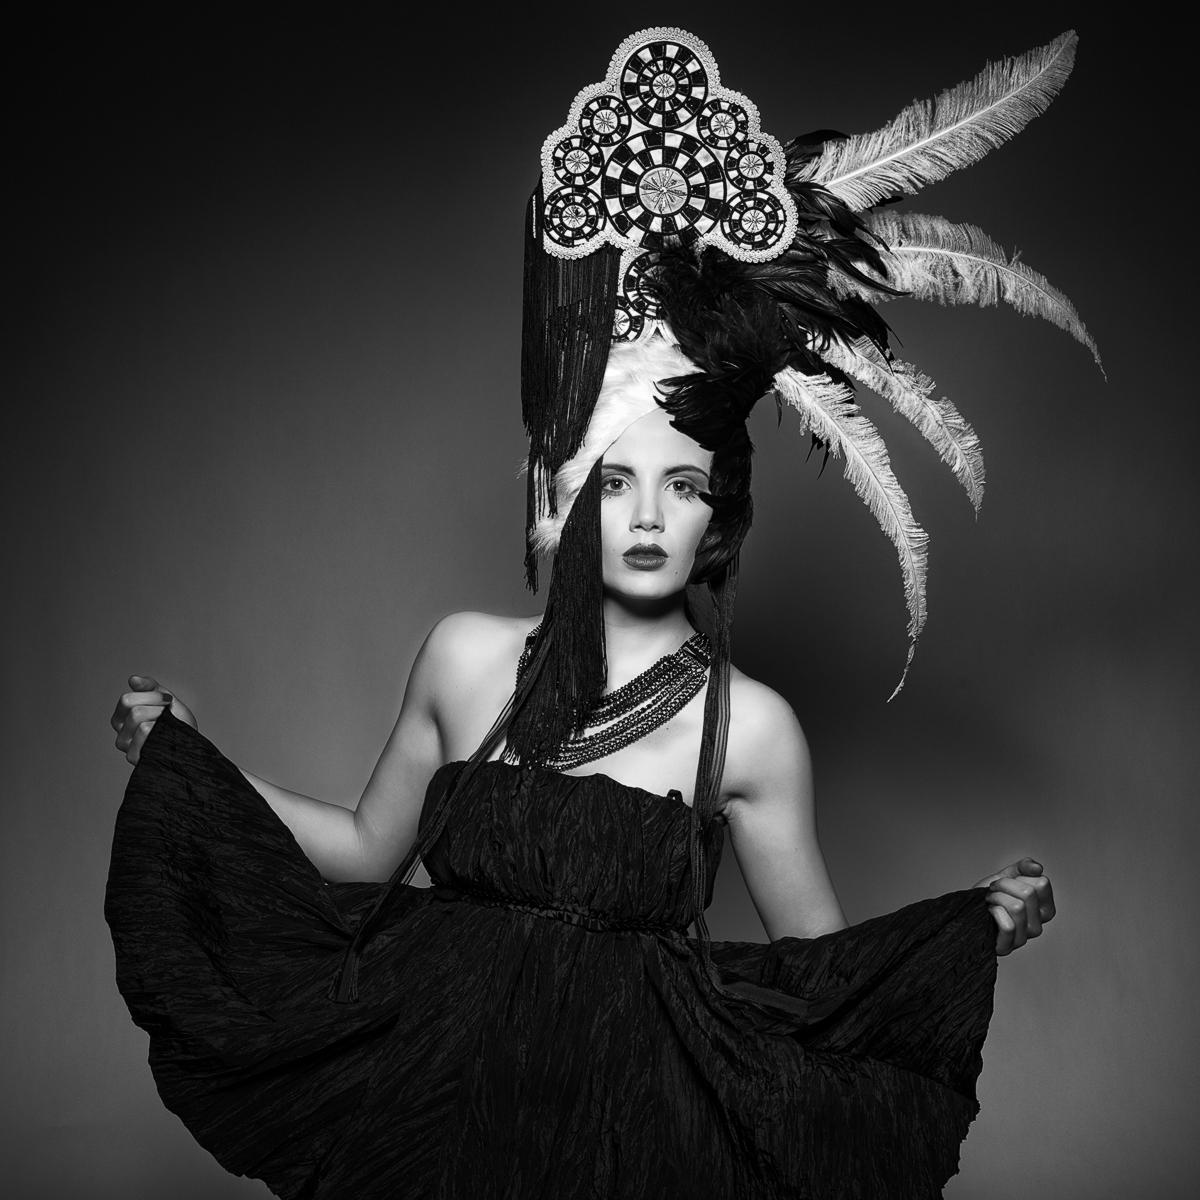 fashion_km-fotografie_072